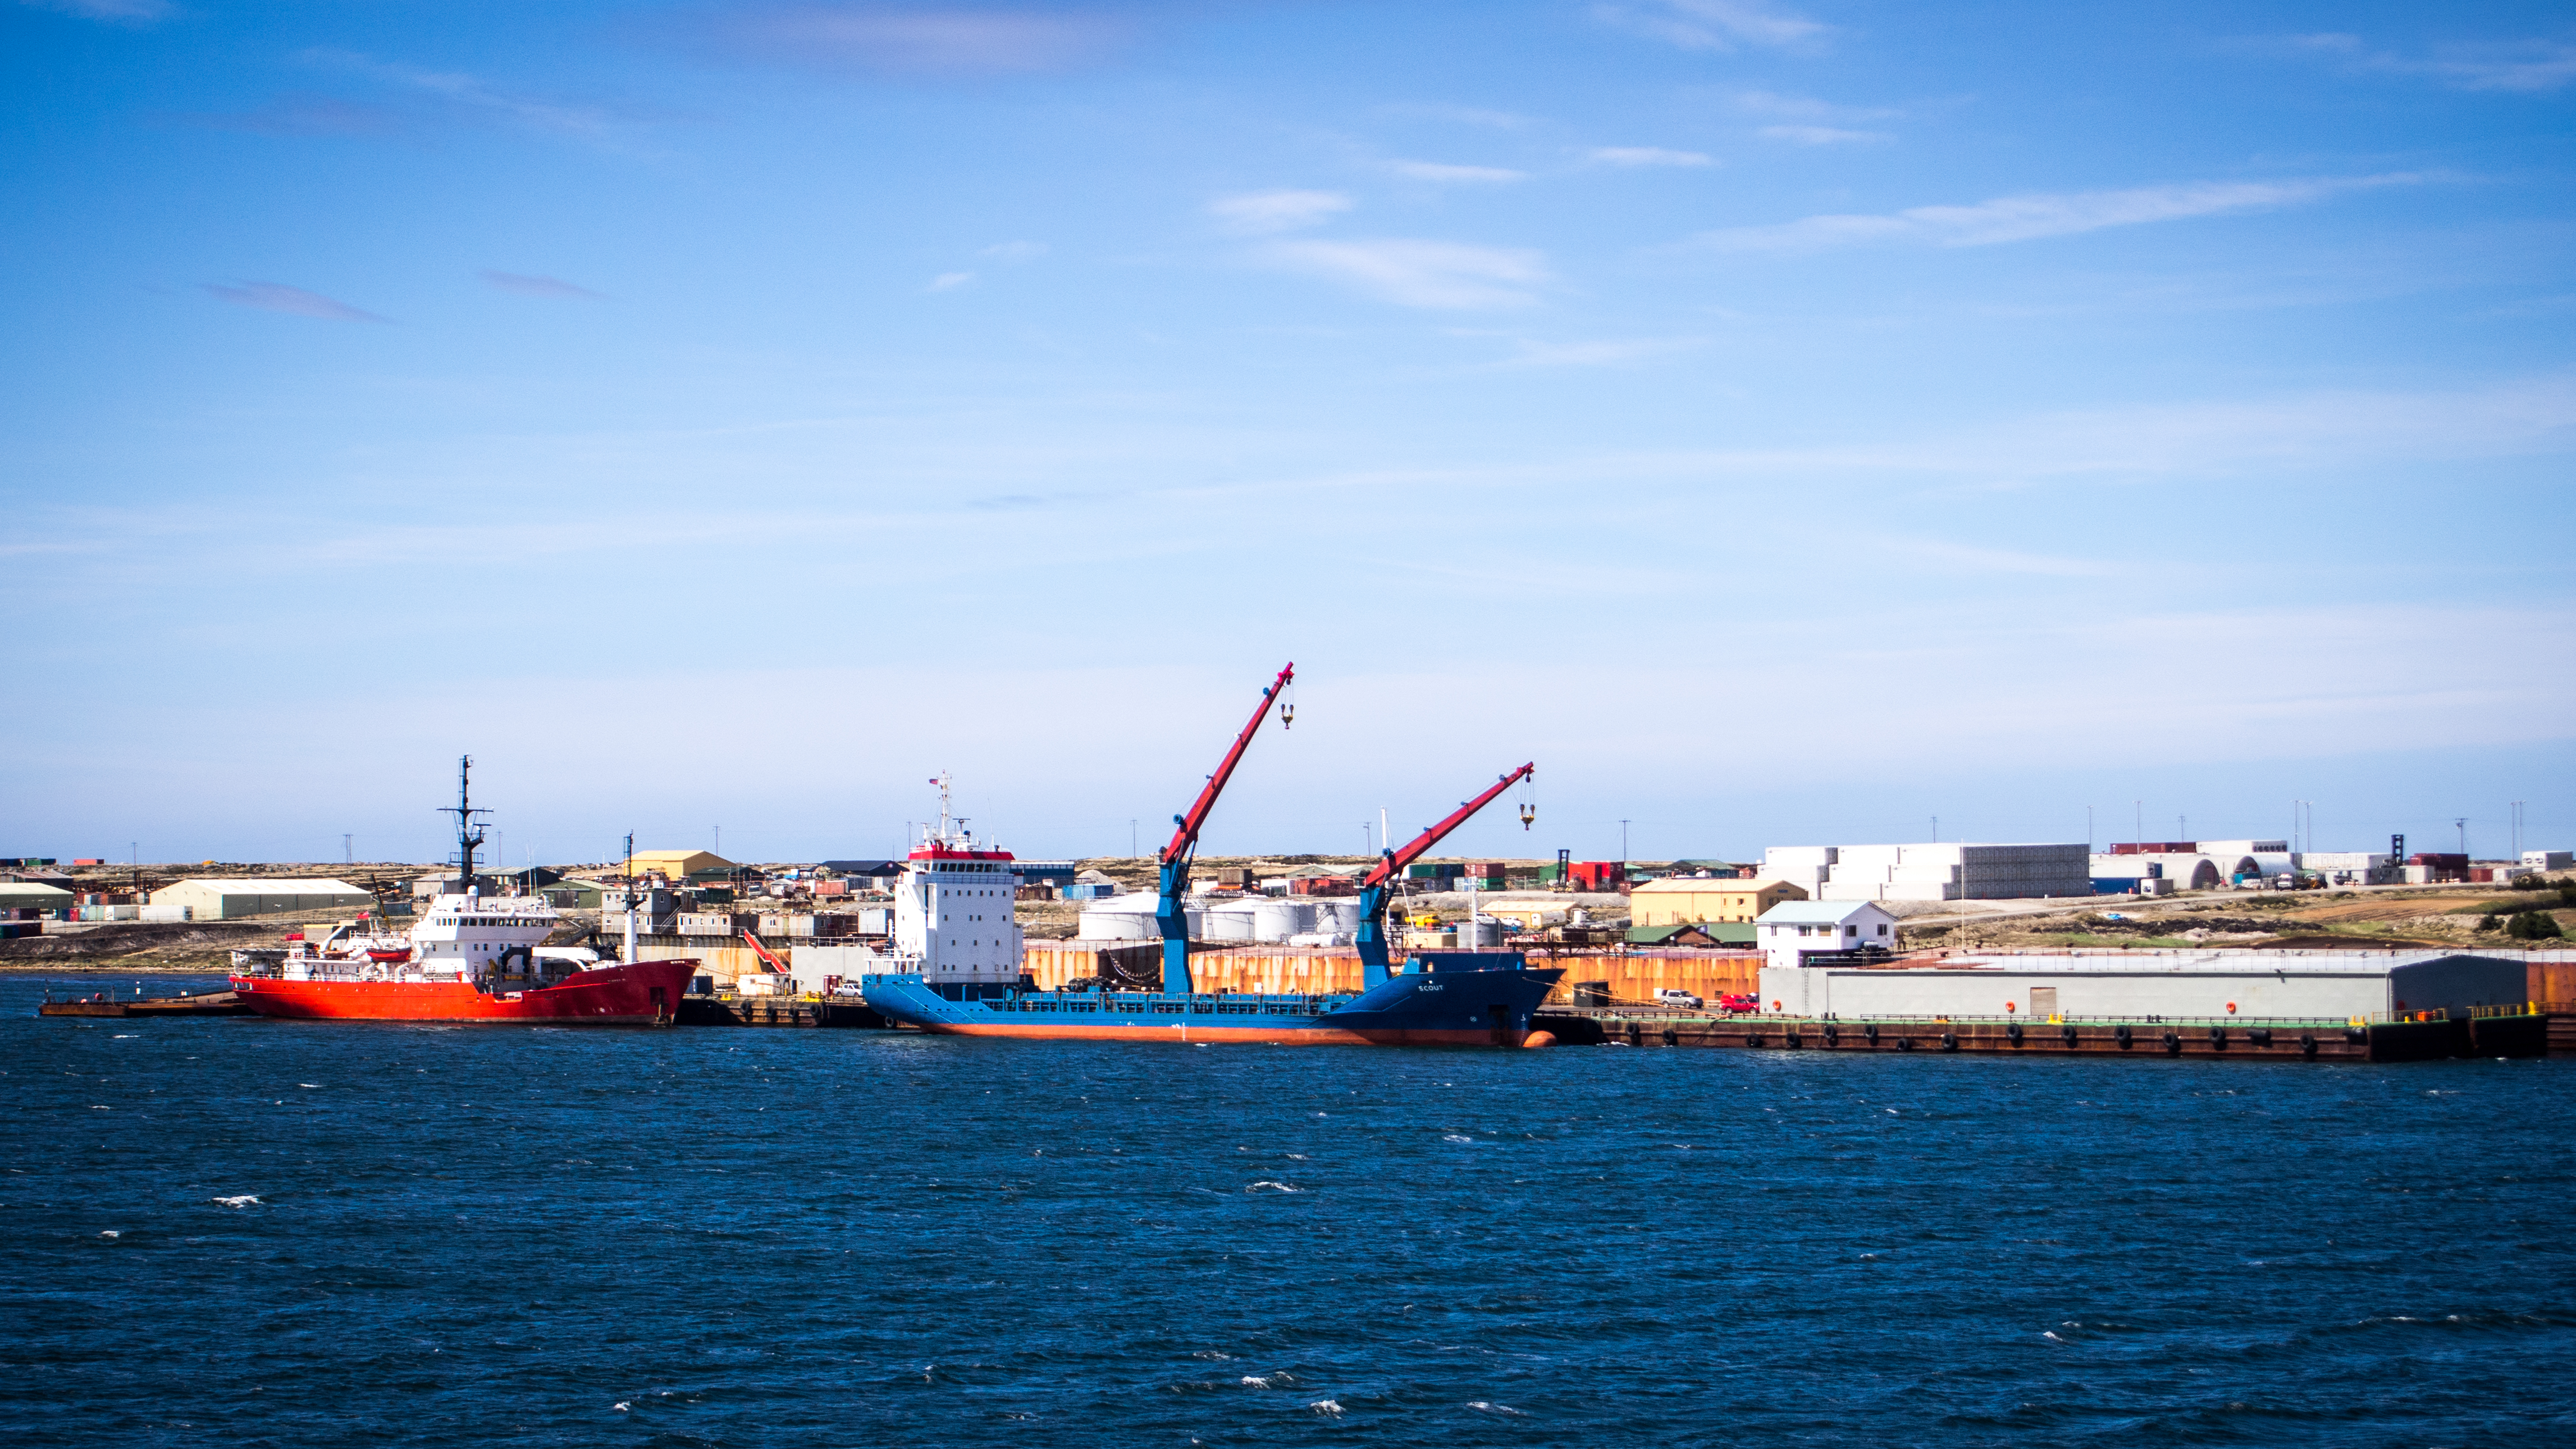 Industrial harbor, Boat, International, Large, Loading, HQ Photo